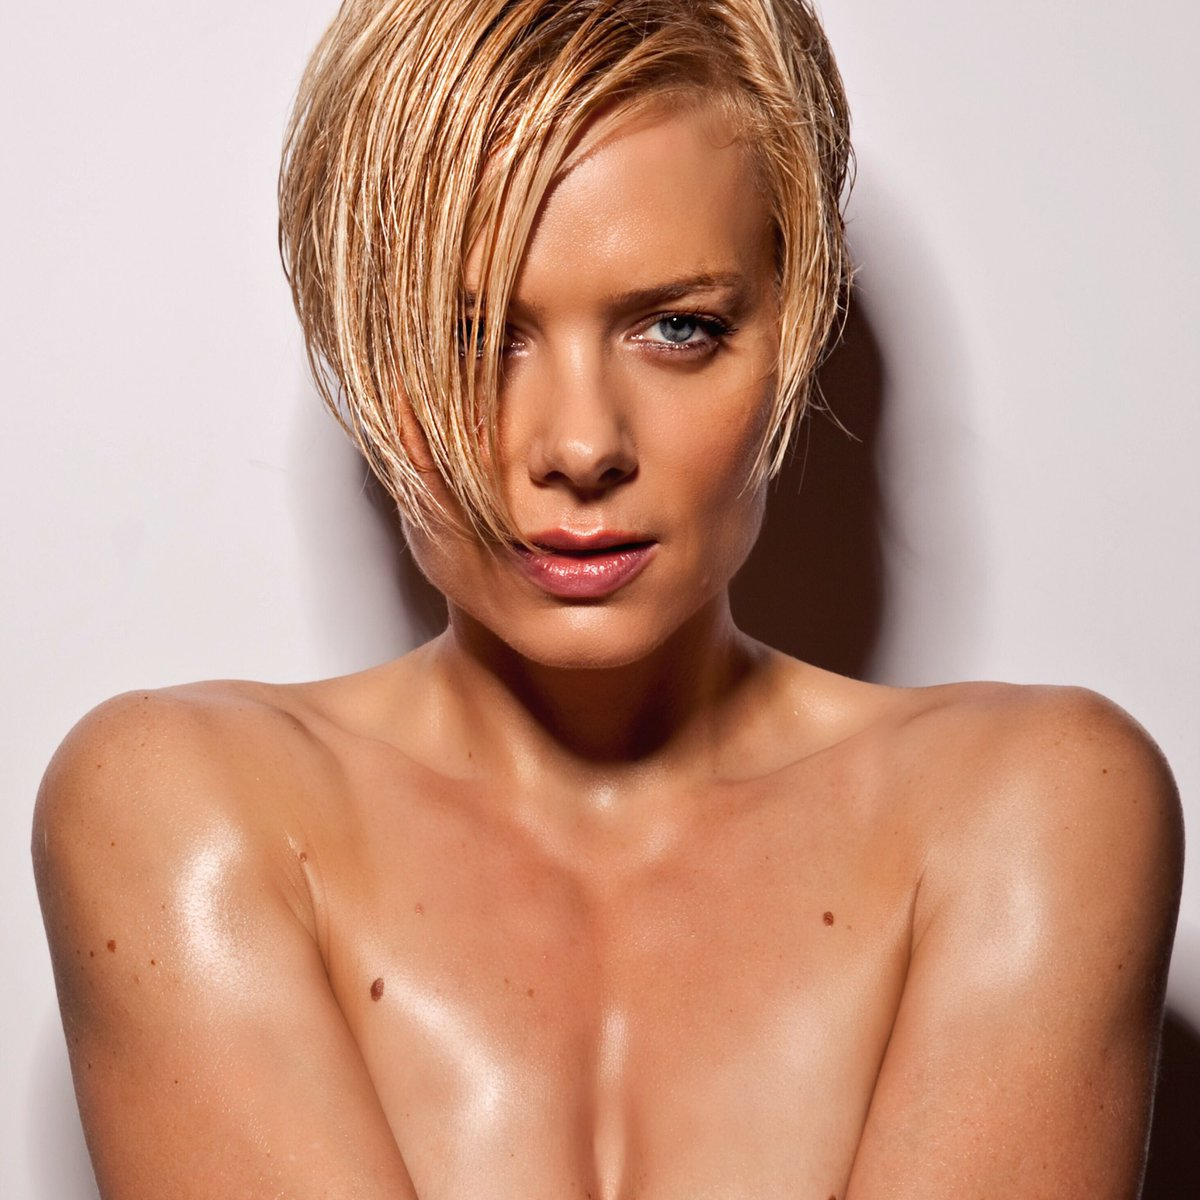 Nina Bergman Denmark Actress, Singer, Songwriter and Model